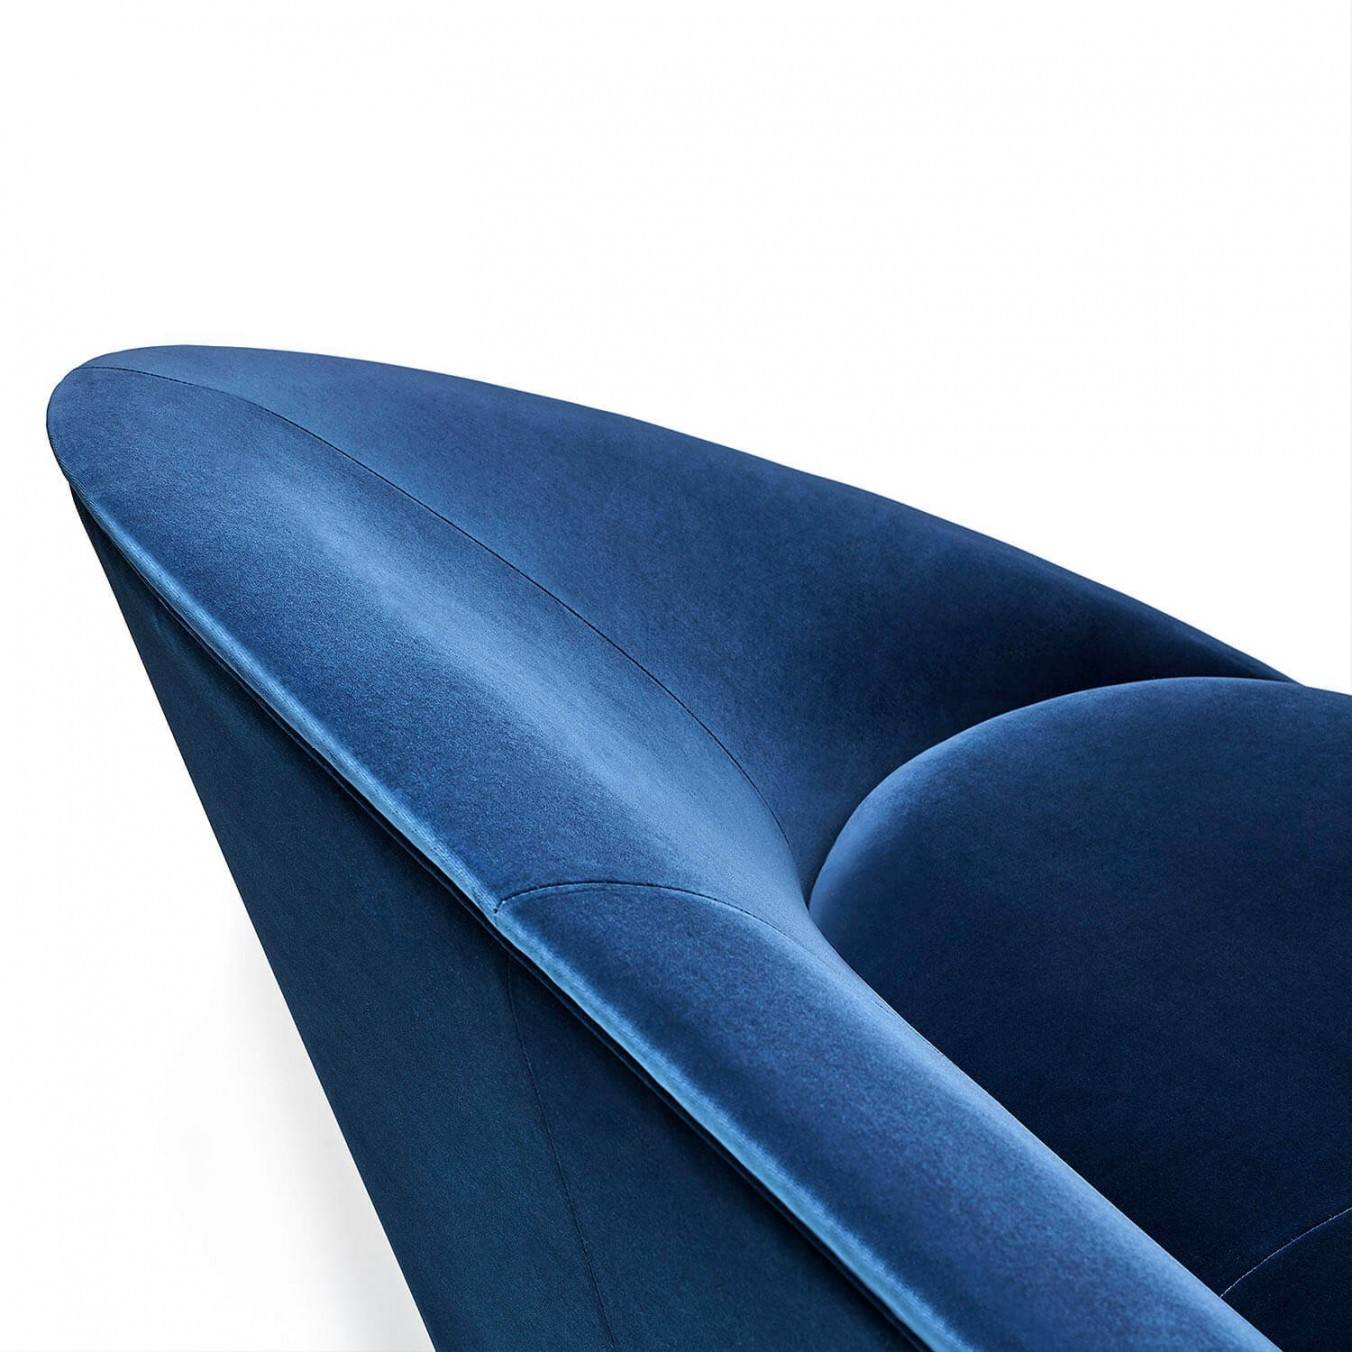 New Life Sofa